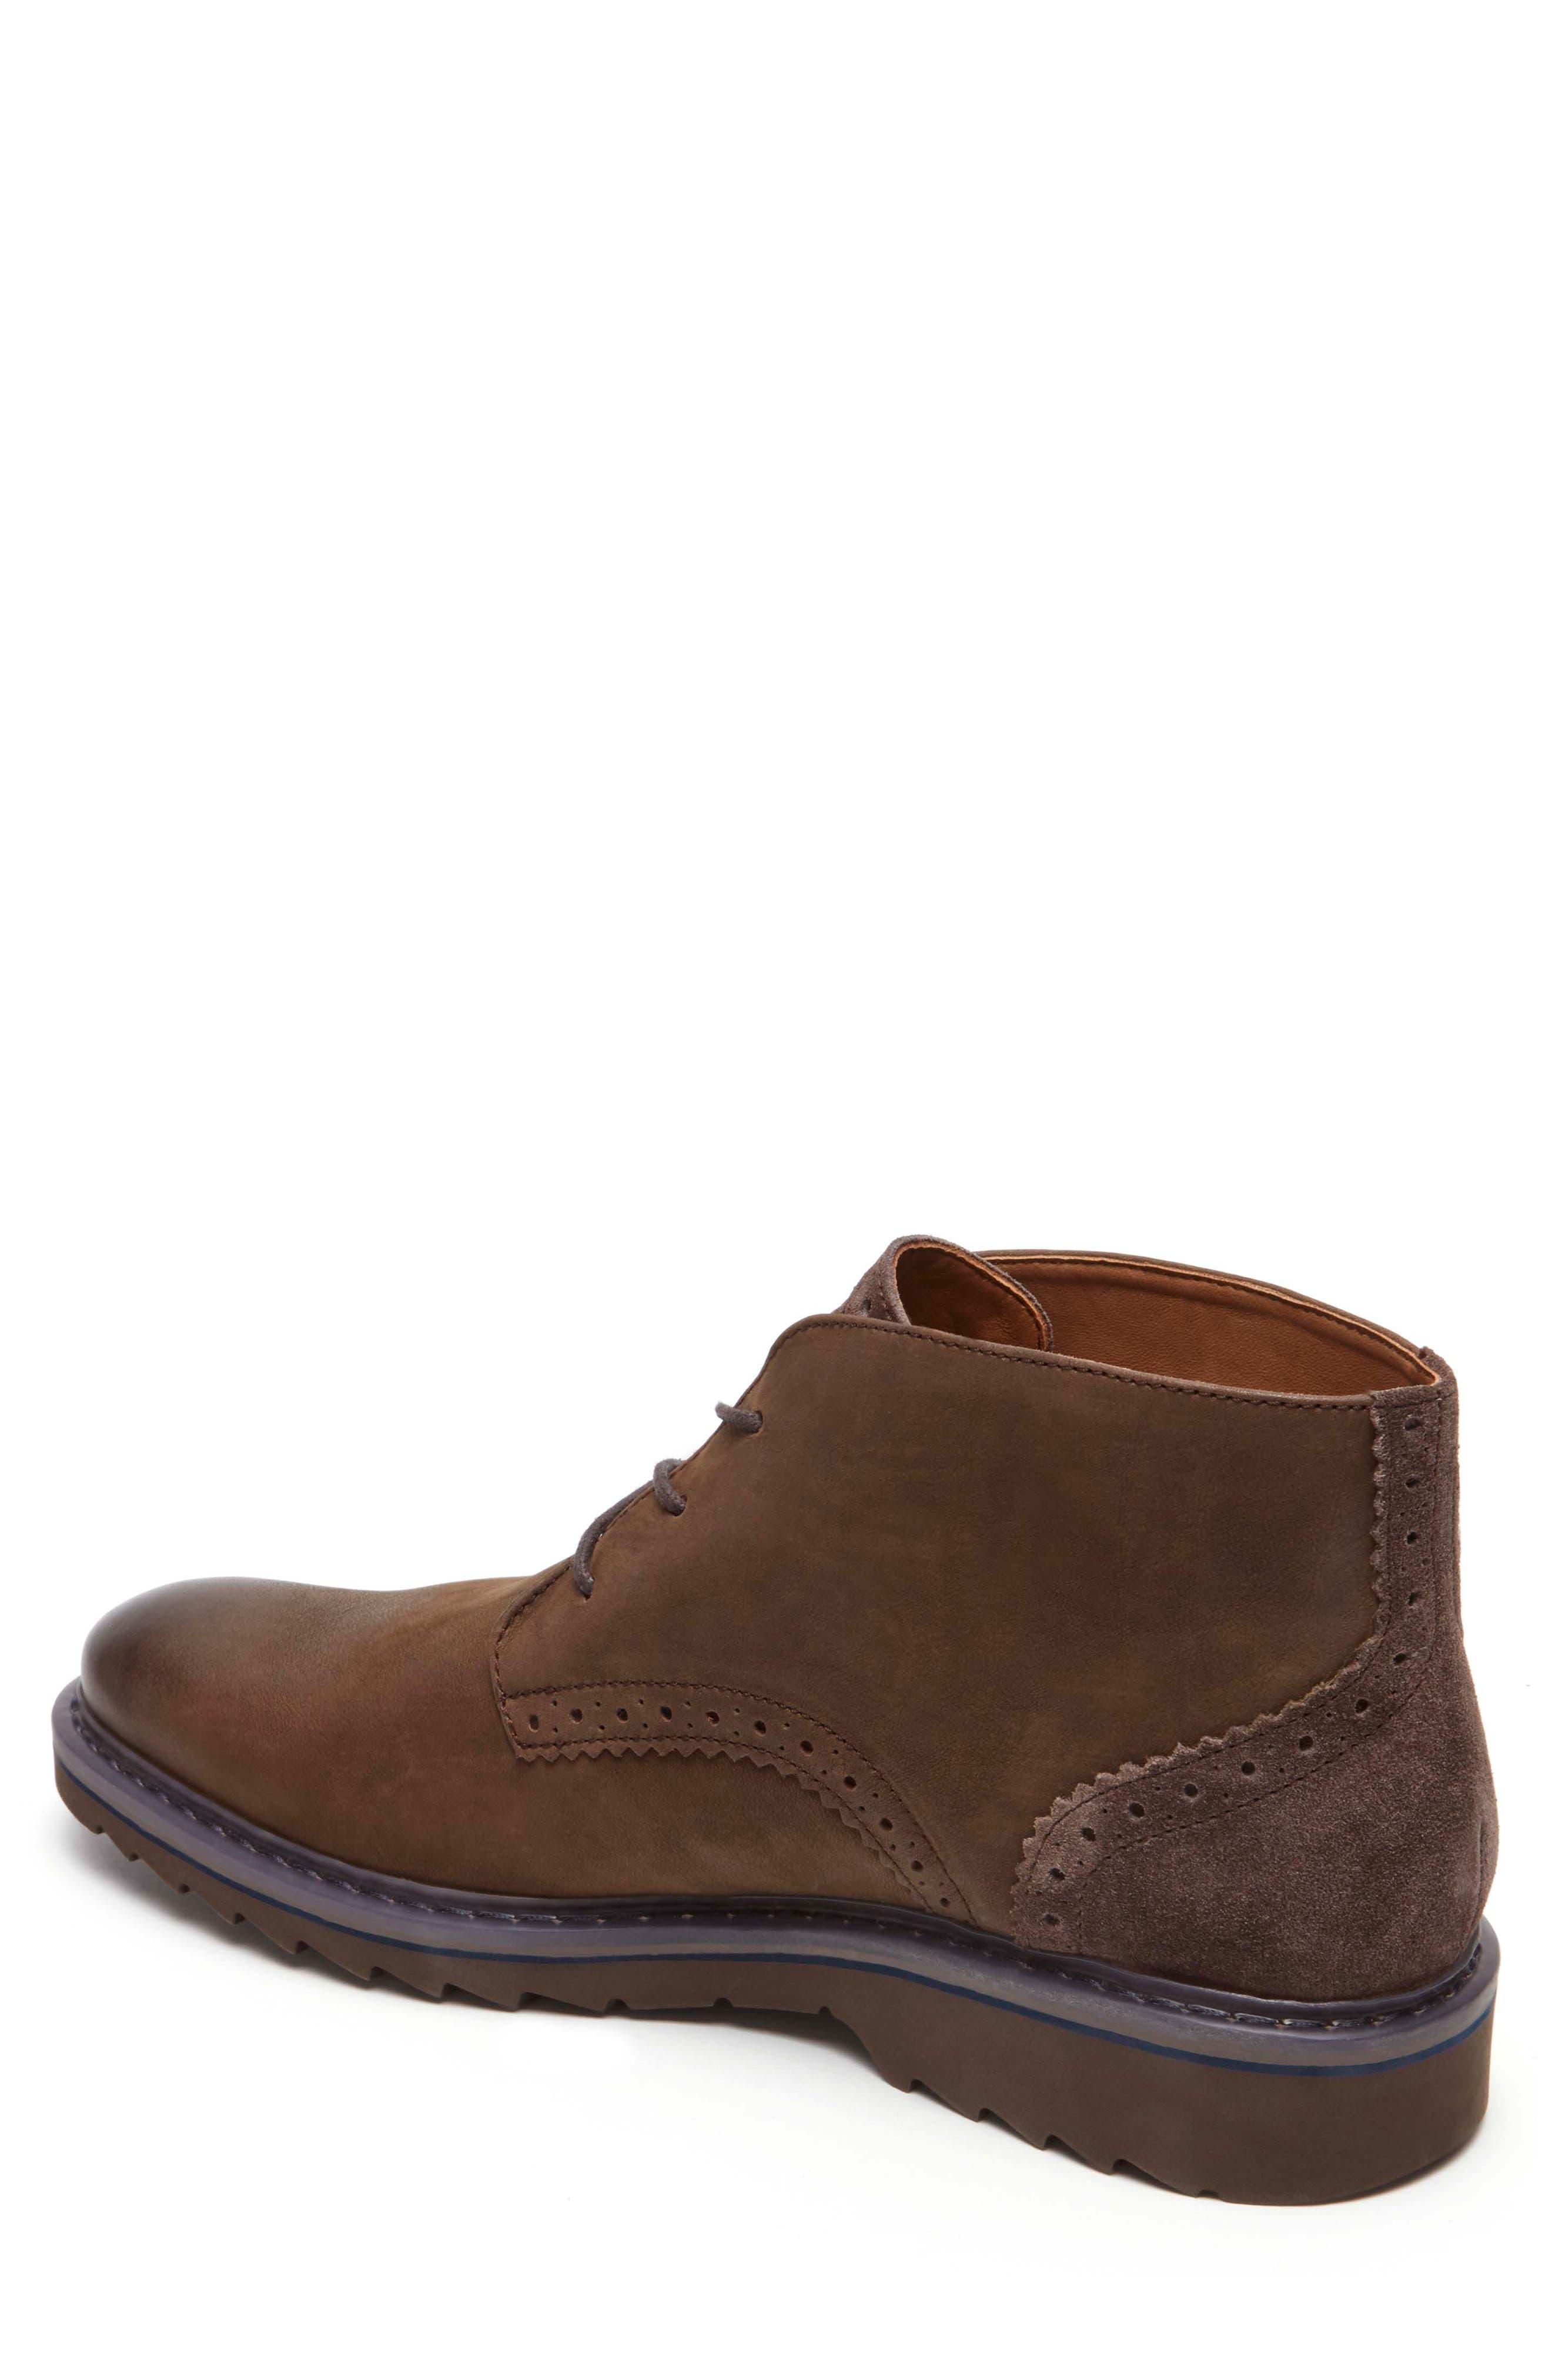 Jaxson Chukka Boot,                             Alternate thumbnail 2, color,                             Brown/ Brown Leather